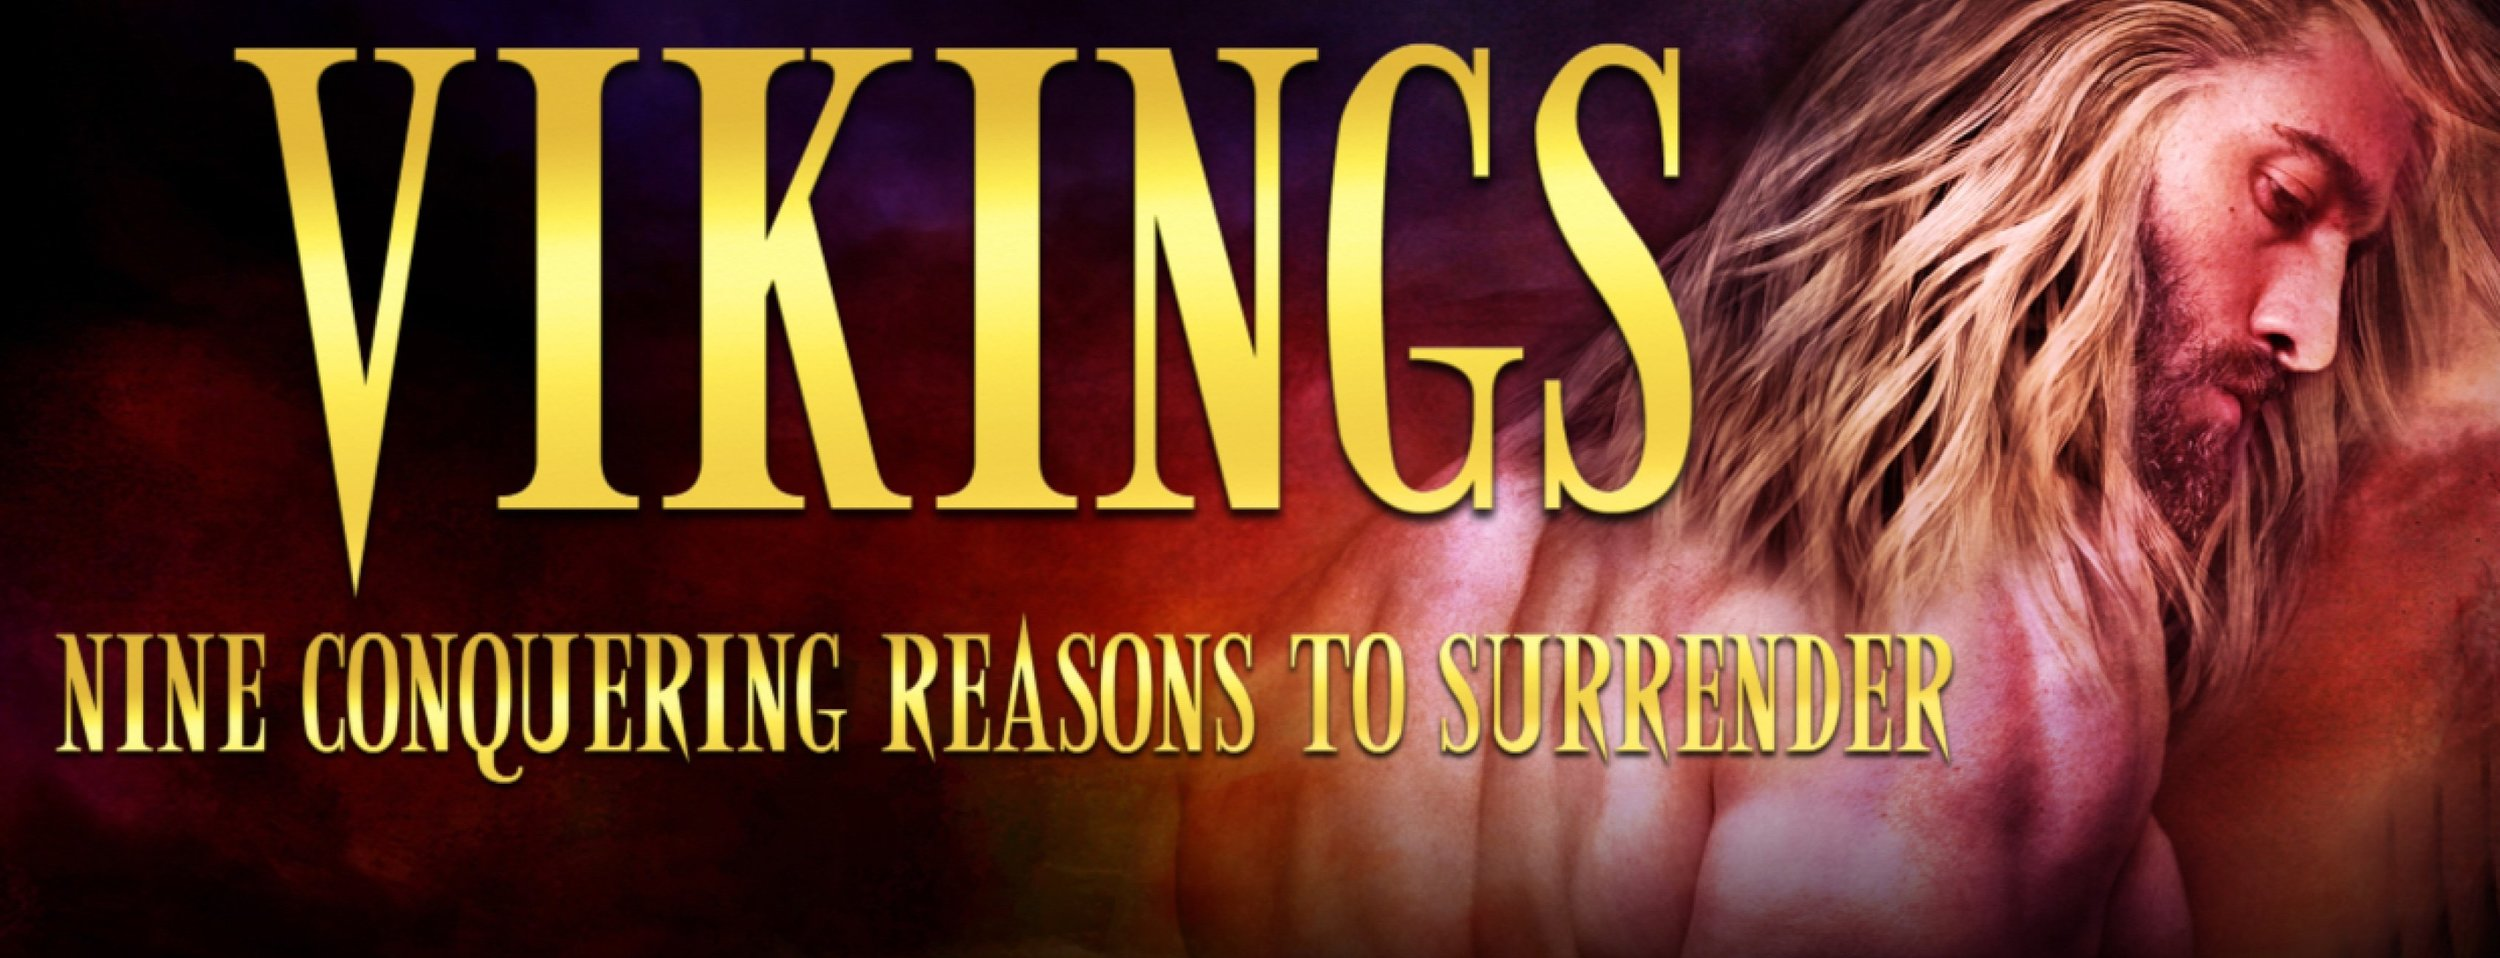 Vikings - AB-FB Banner 2.jpg